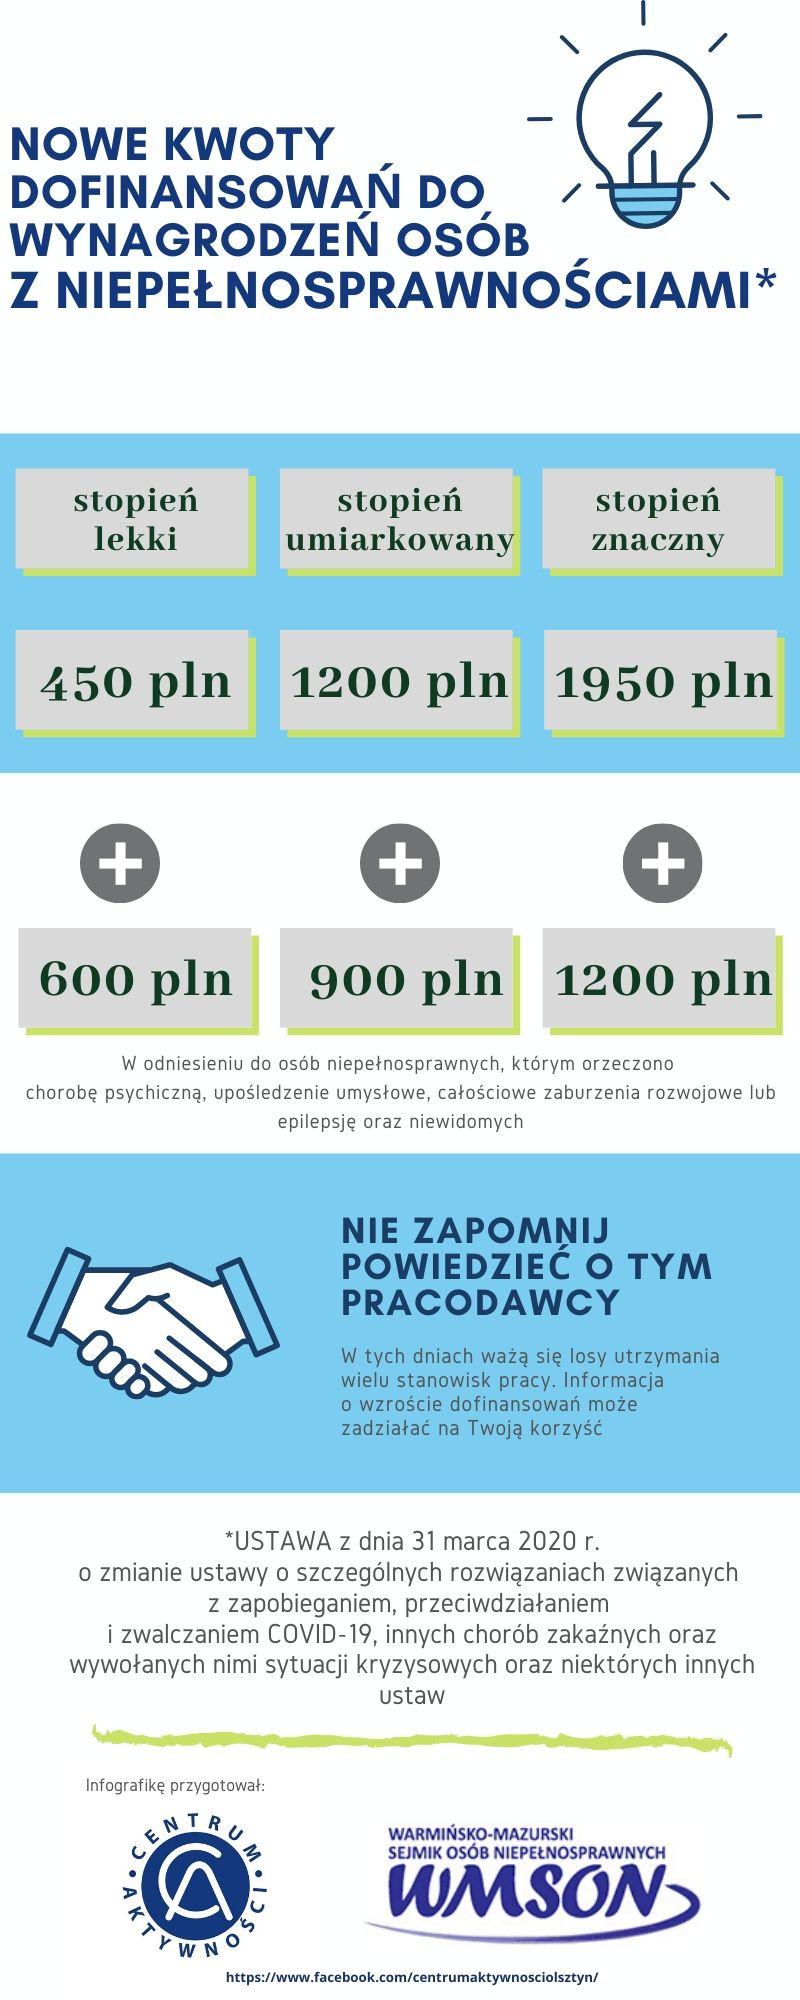 http://m.wm.pl/2020/05/orig/infografika-dofinansowania-od-1-04-2020r-627086.jpg